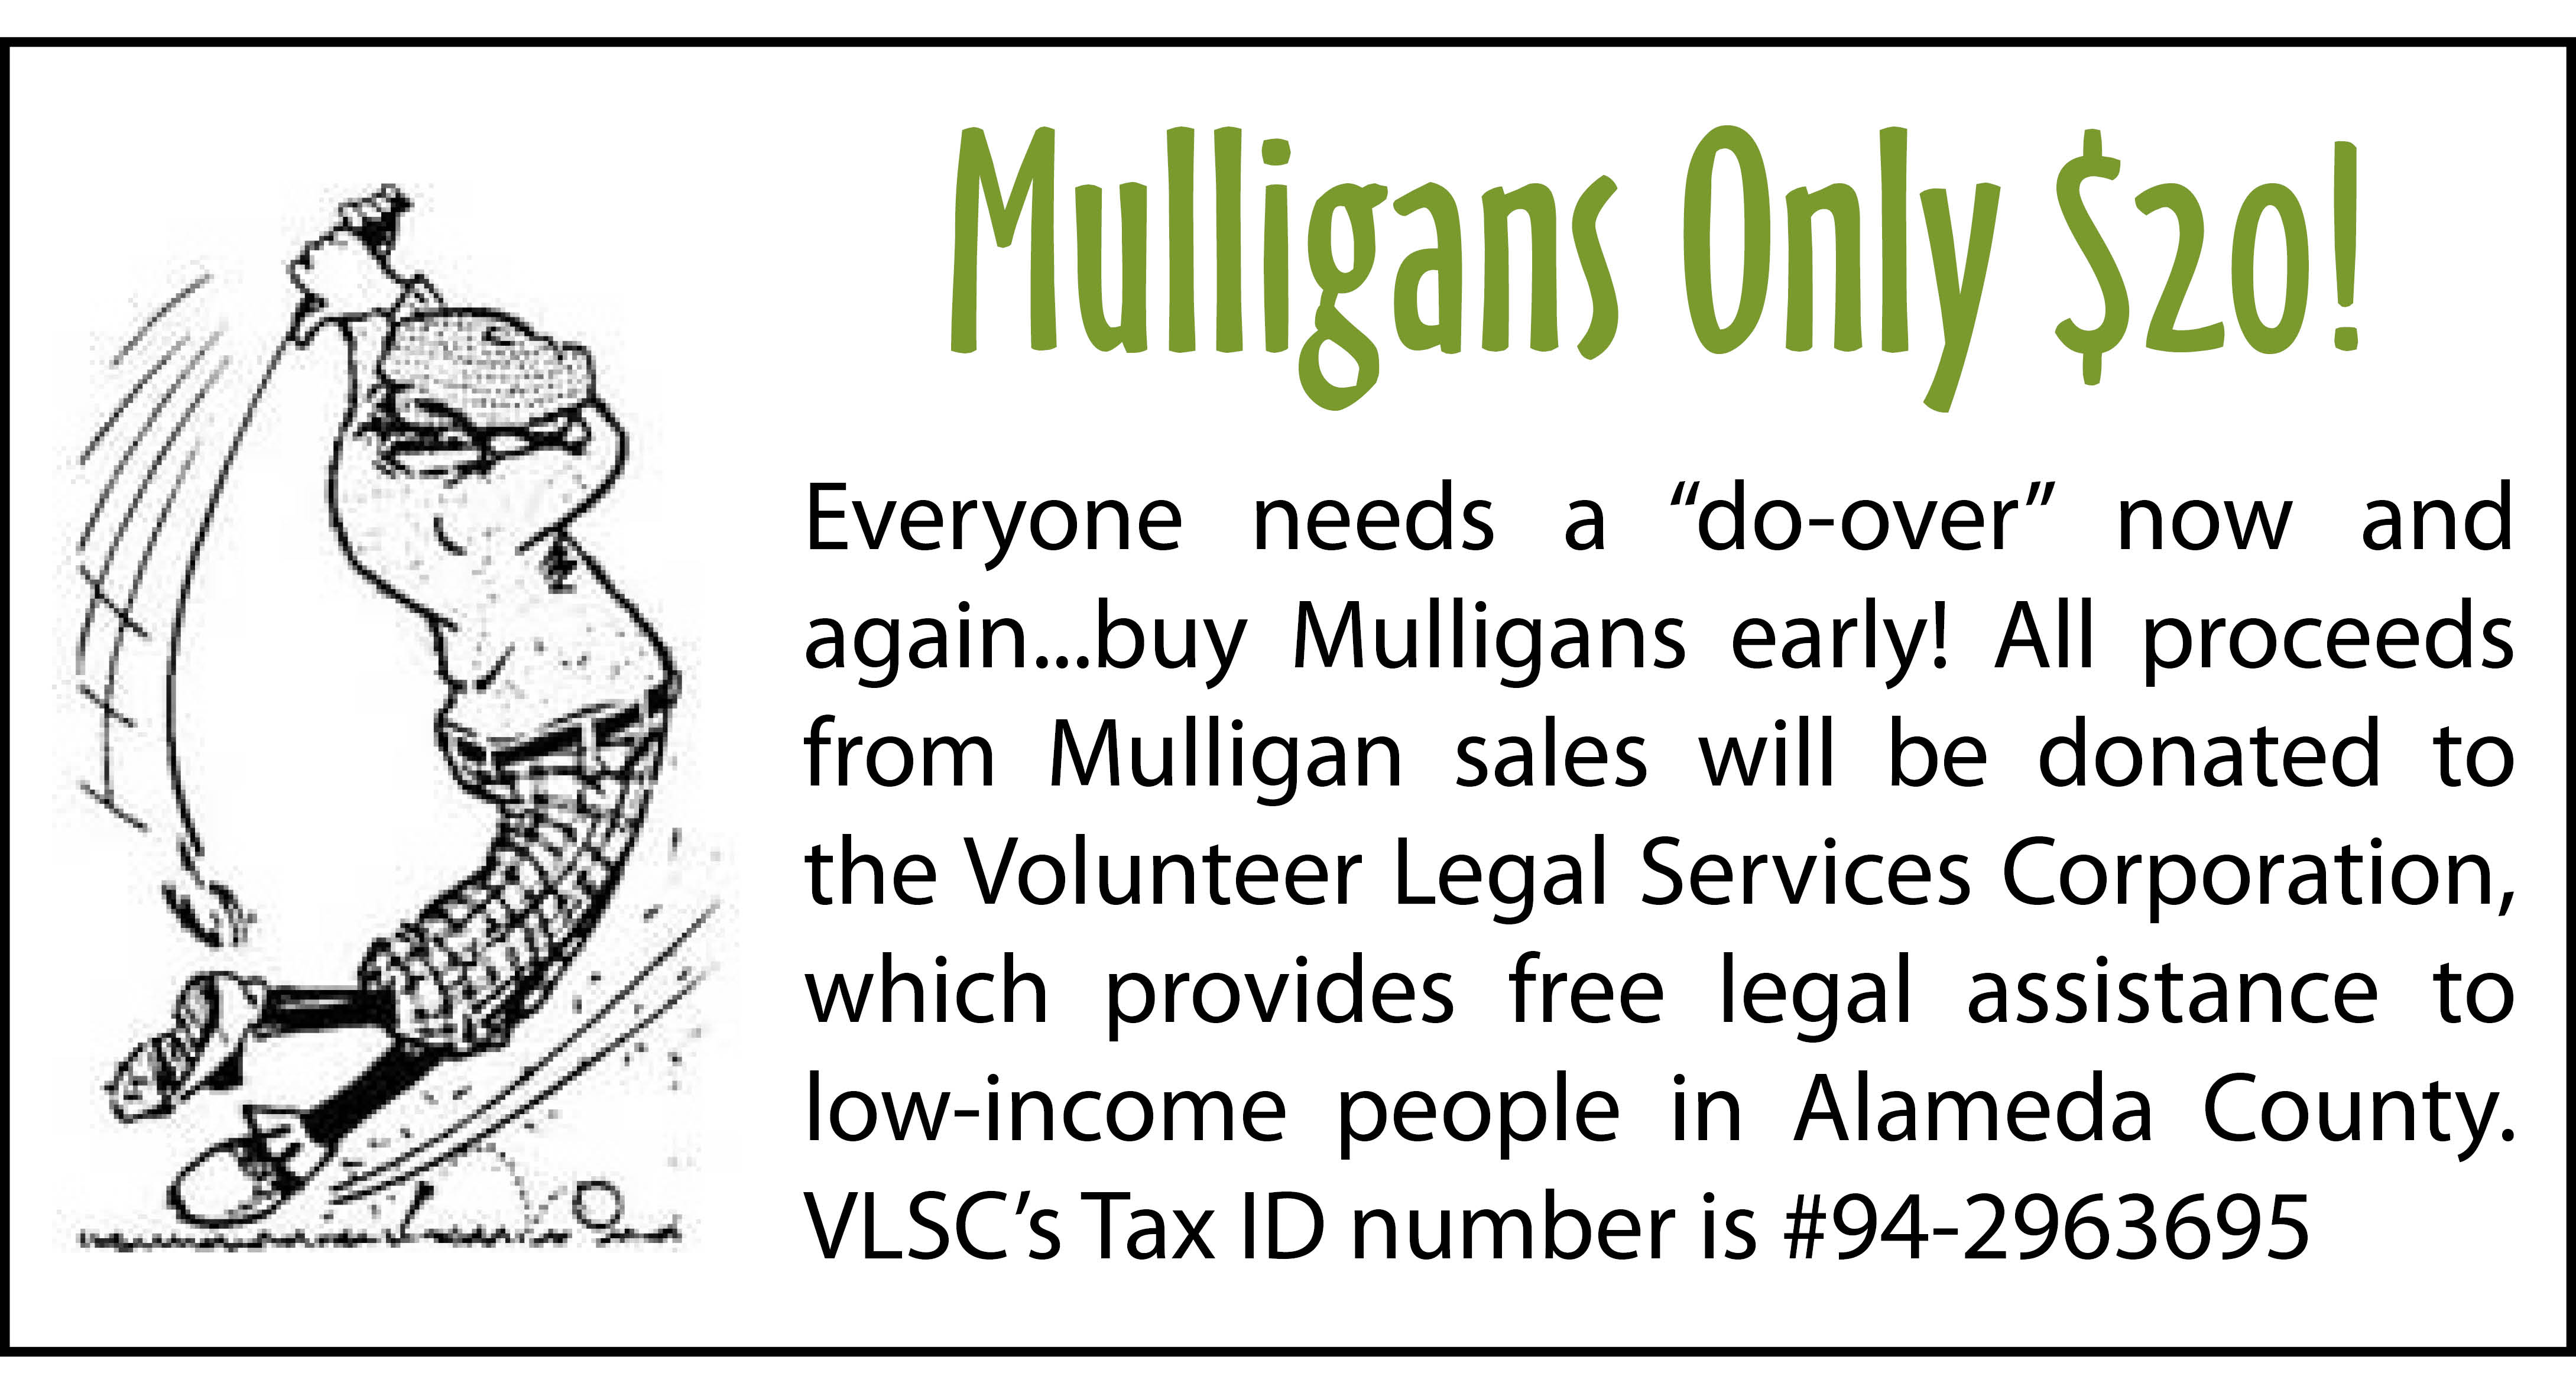 Mulligans only $20!